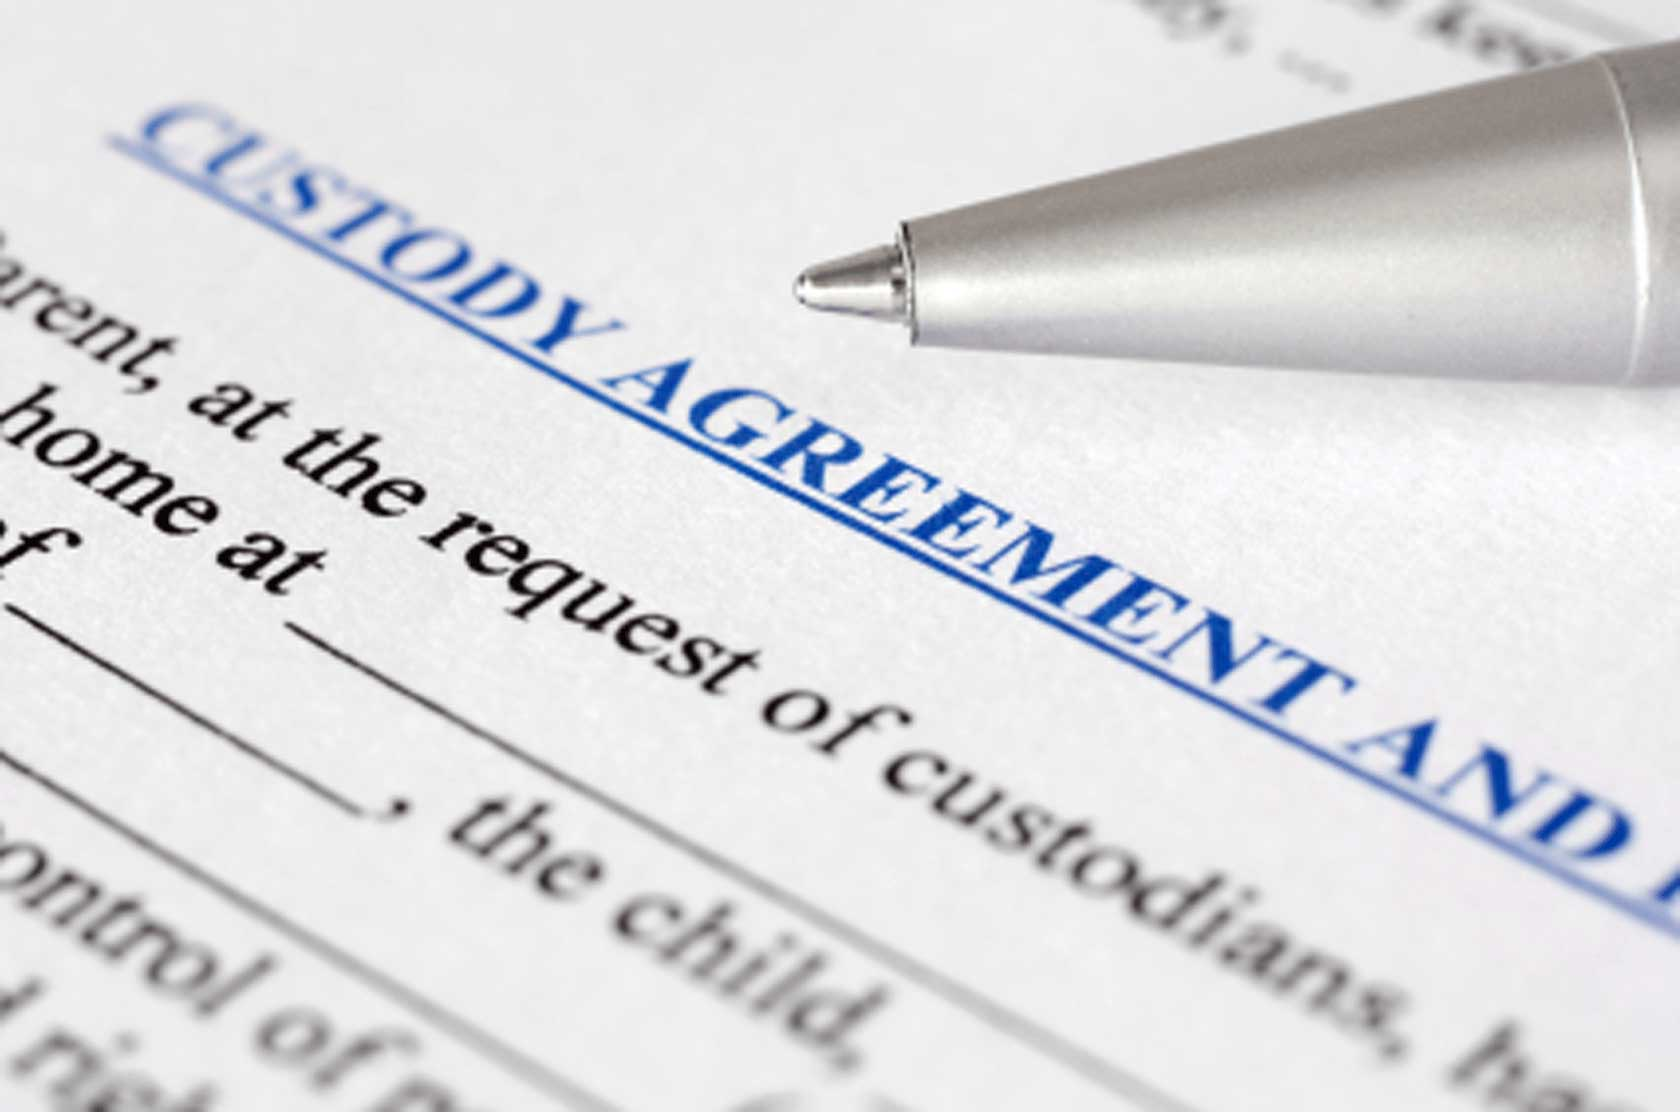 Orlando Child Custody Modification Attorney Orange County Florida Time Sharing Modification Lawyer Seminole County Custody Modification Osceola County